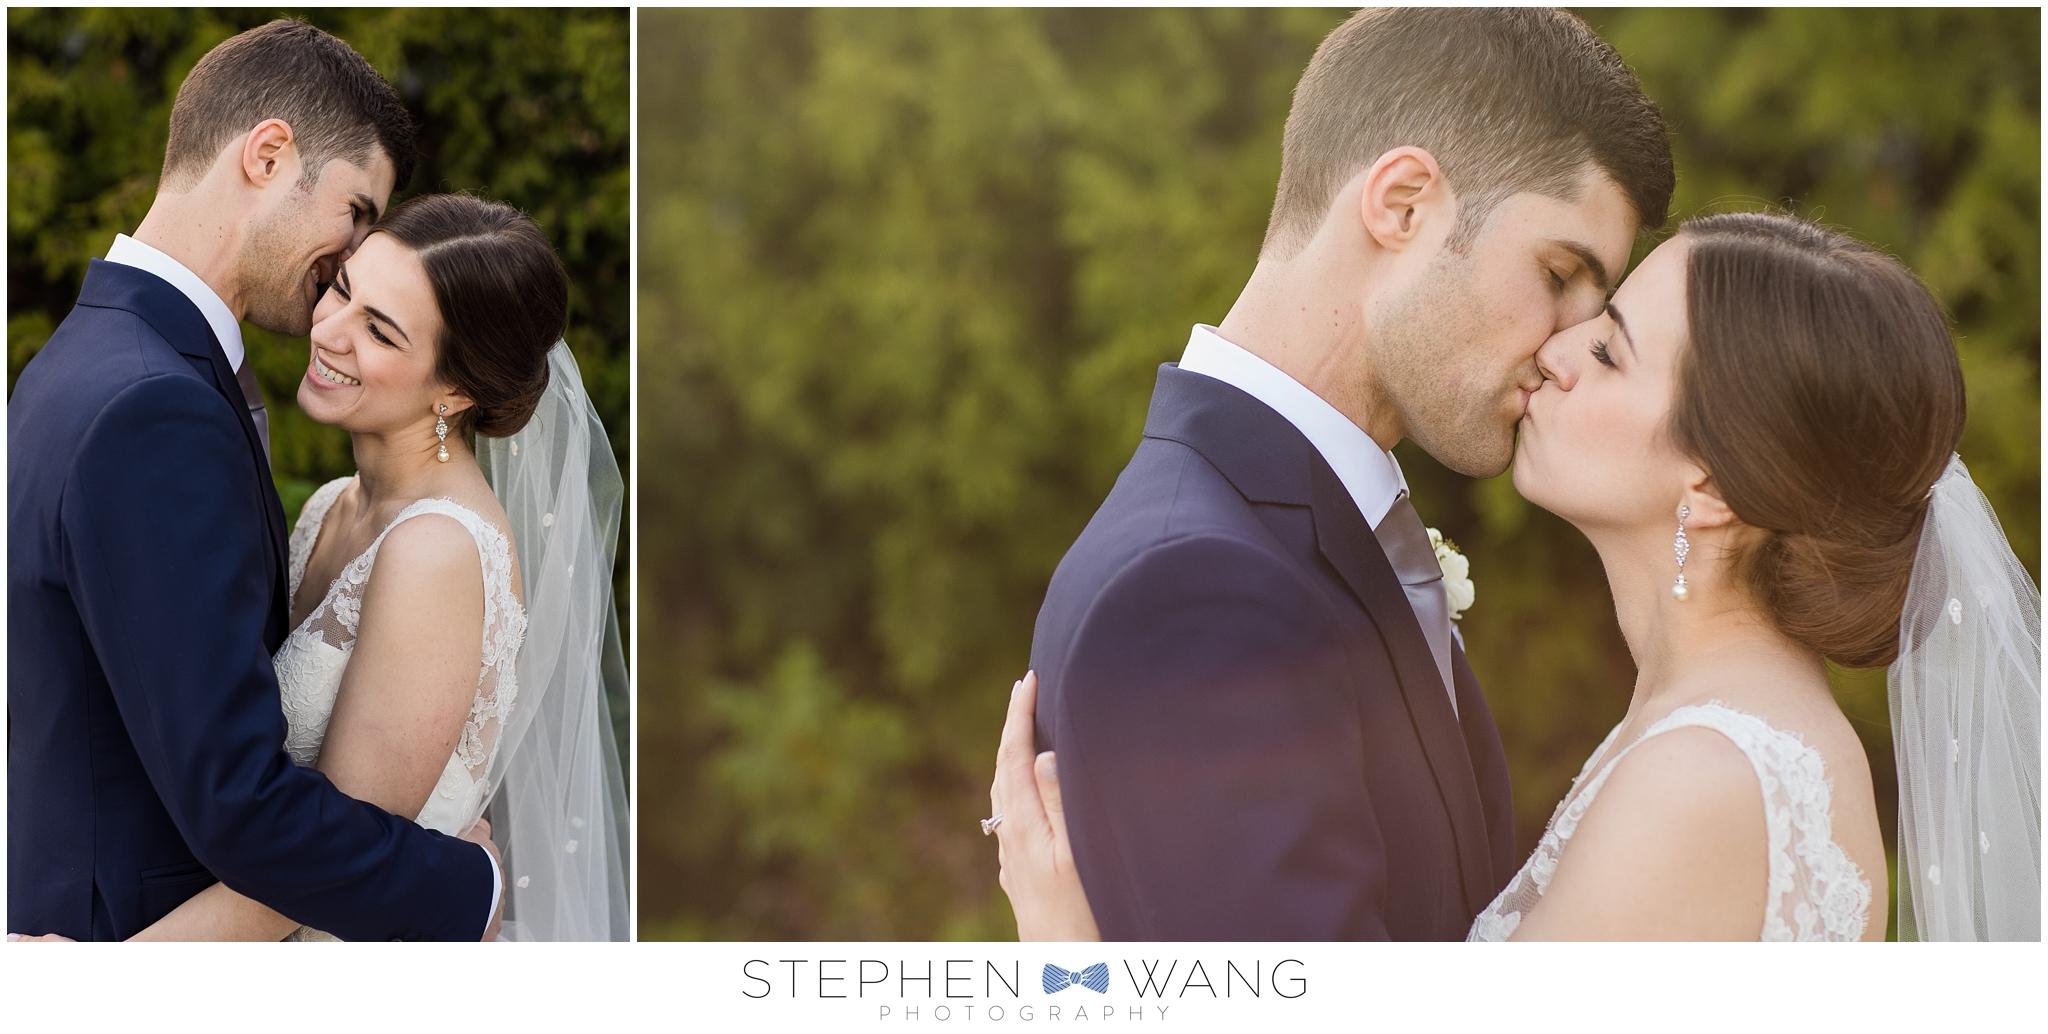 Stephen Wang Photography Shorehaven Norwalk CT Wedding Photographer connecticut shoreline shore haven - 28.jpg